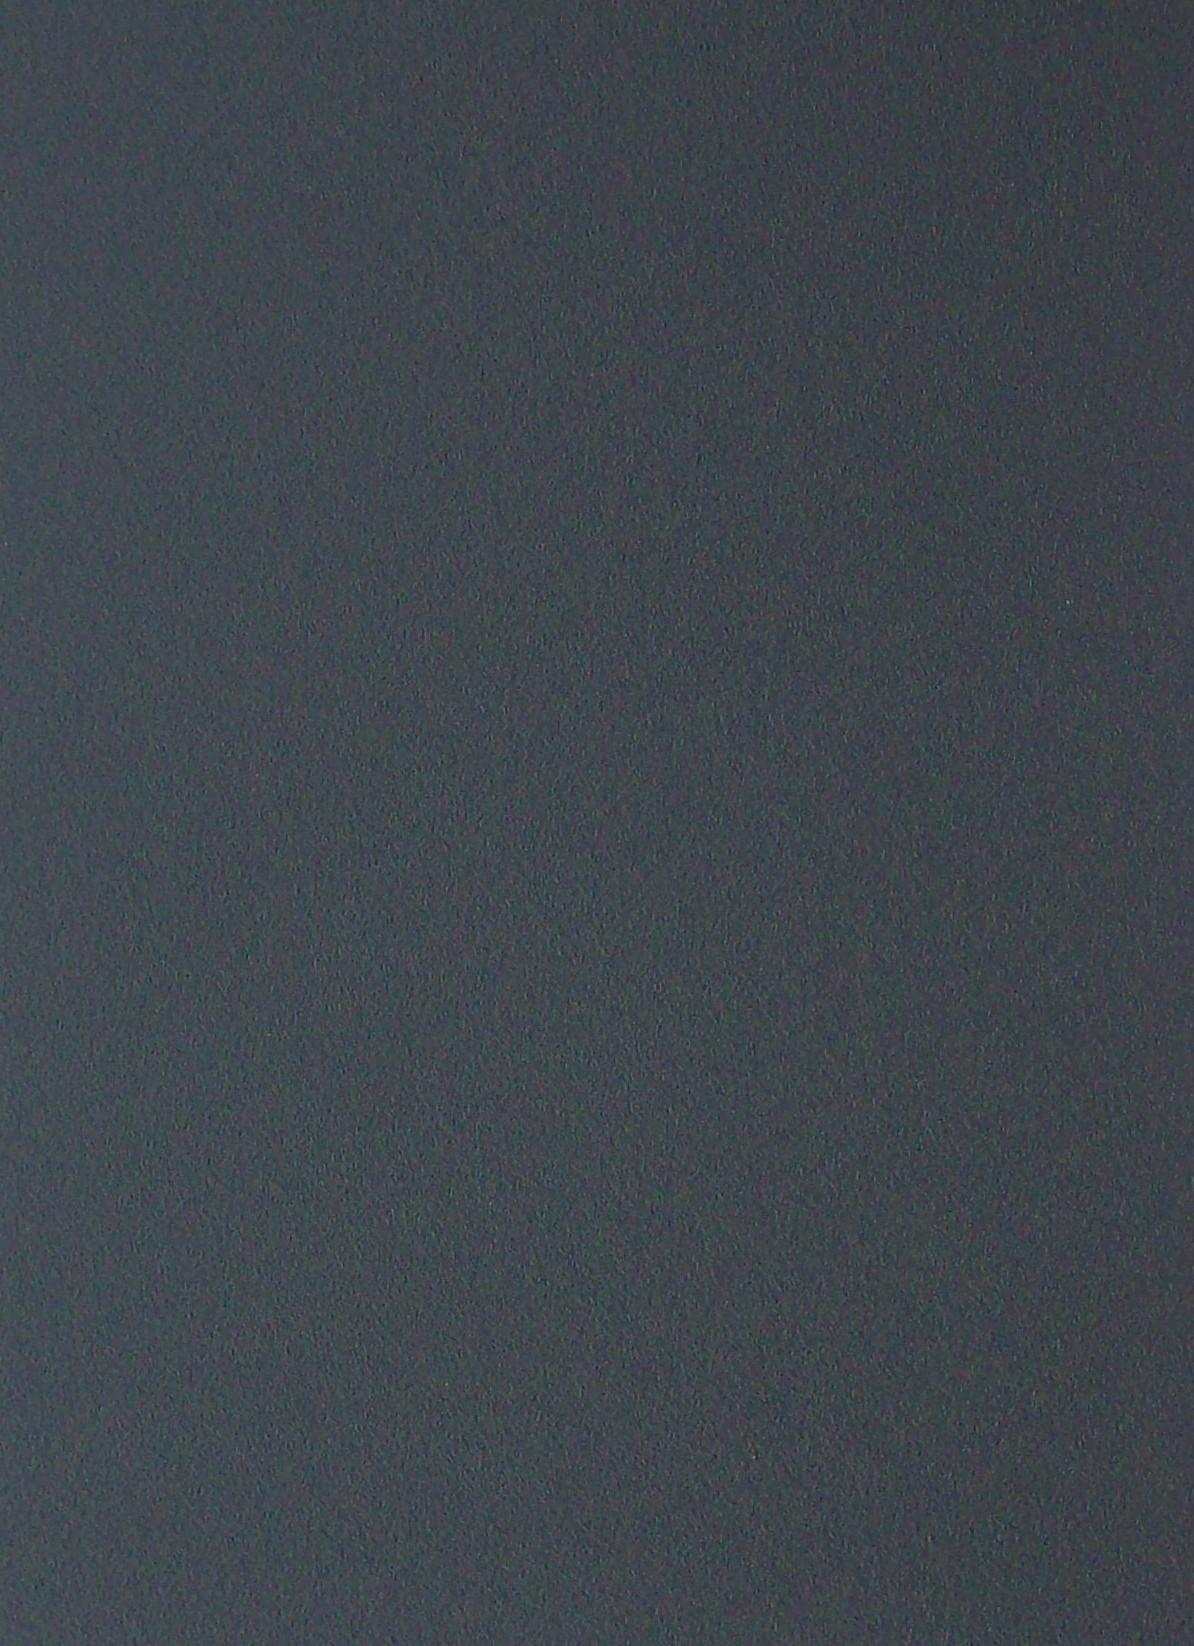 Texture Color Catalog | Samples | Nortek Powder Coating